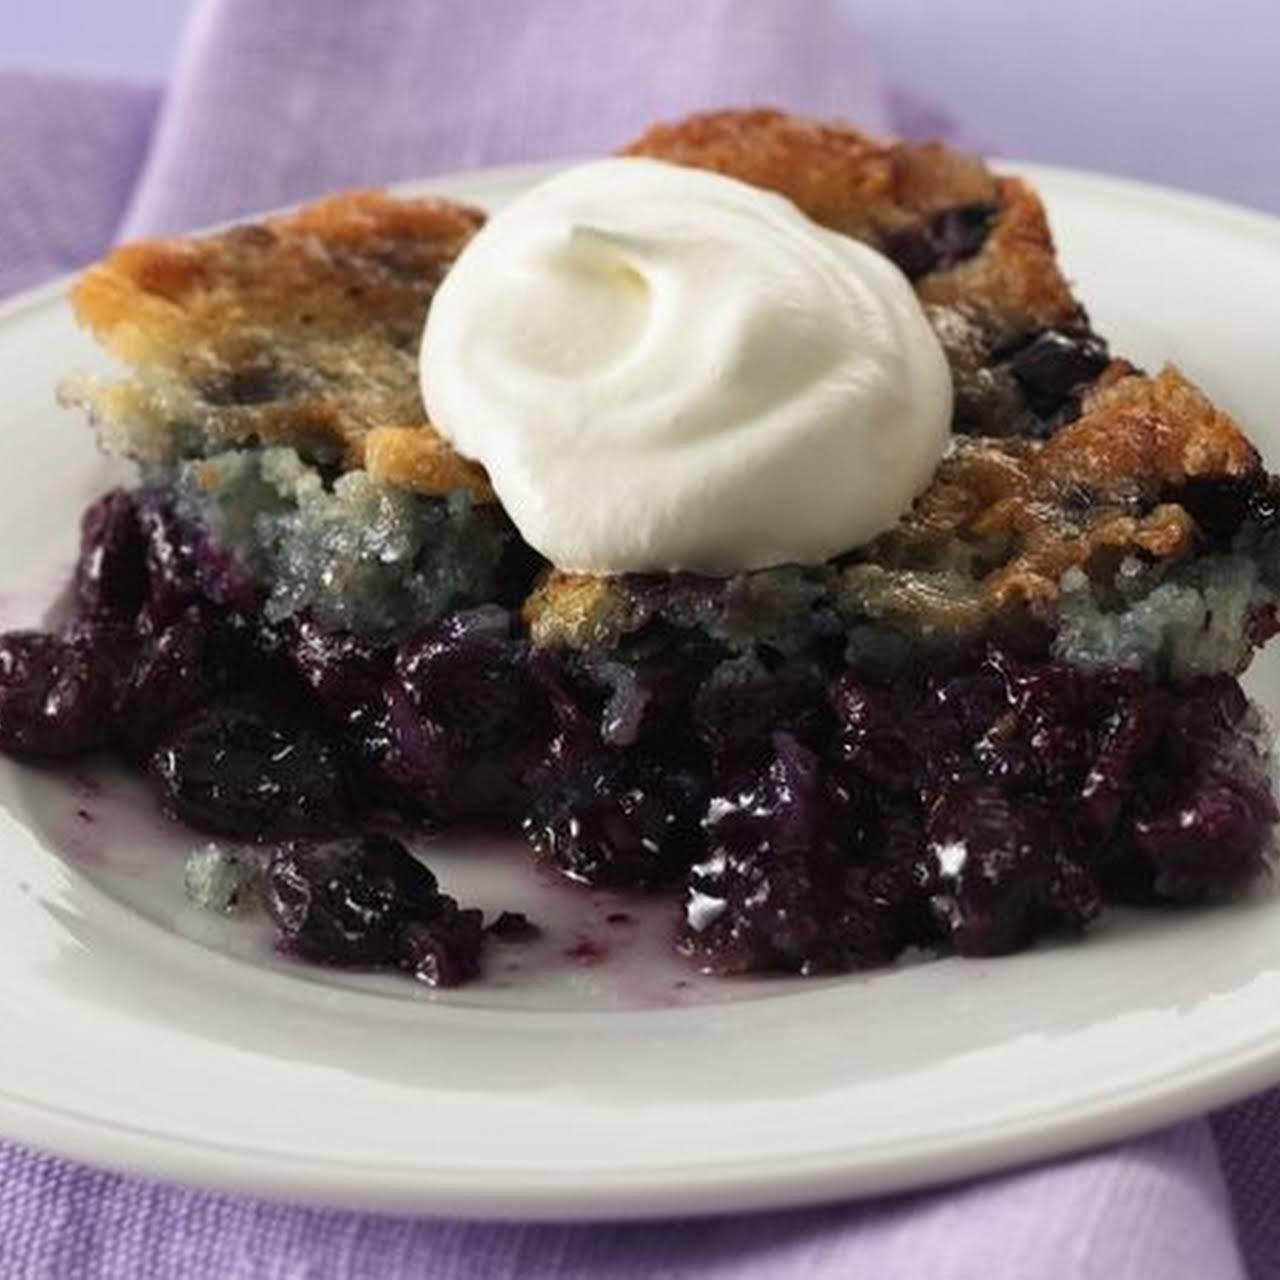 blueberry dessert recipes low calorie Country Blueberry Dessert